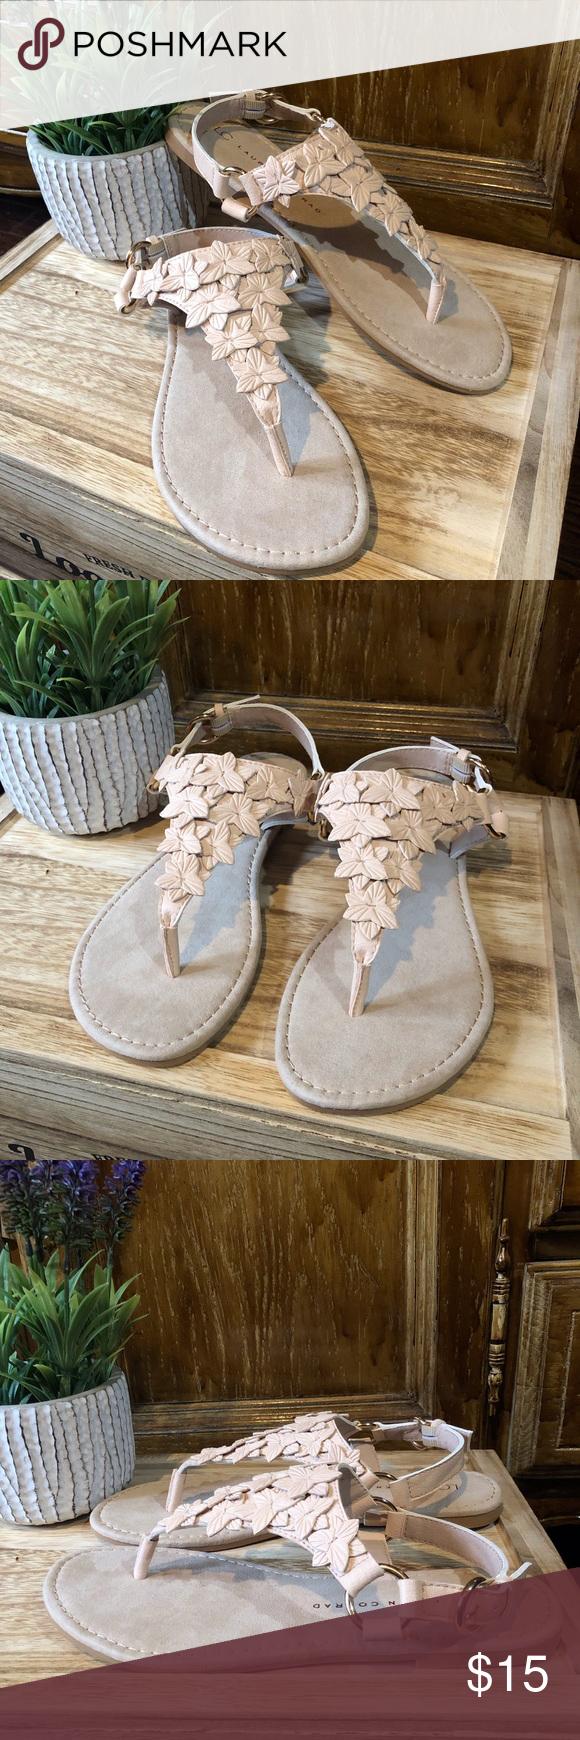 LC Lauren Conrad Brand New! | Lauren conrad shoes, Lc